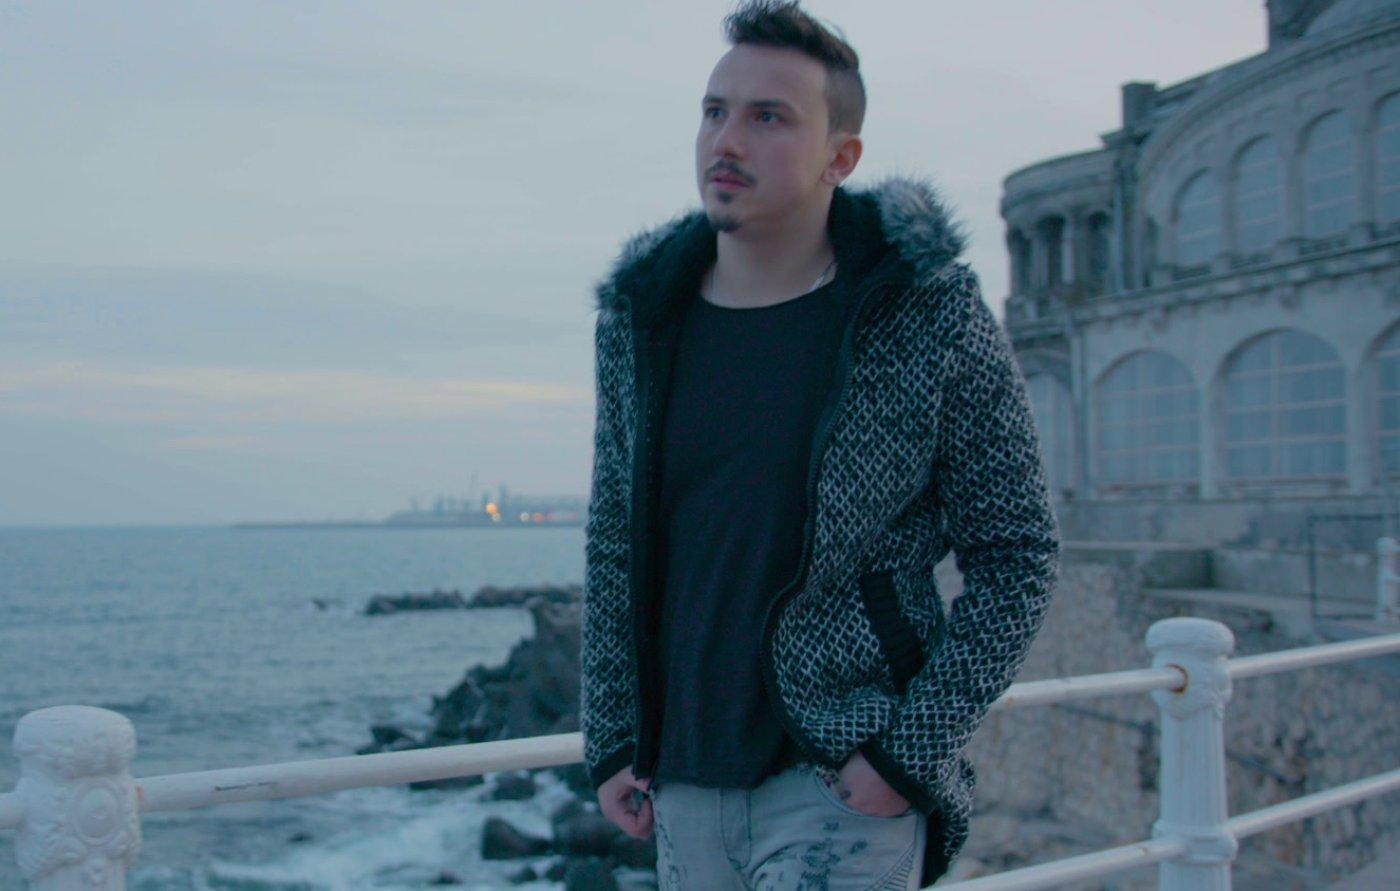 Интересни локации в Румъния в новия клип на Денис